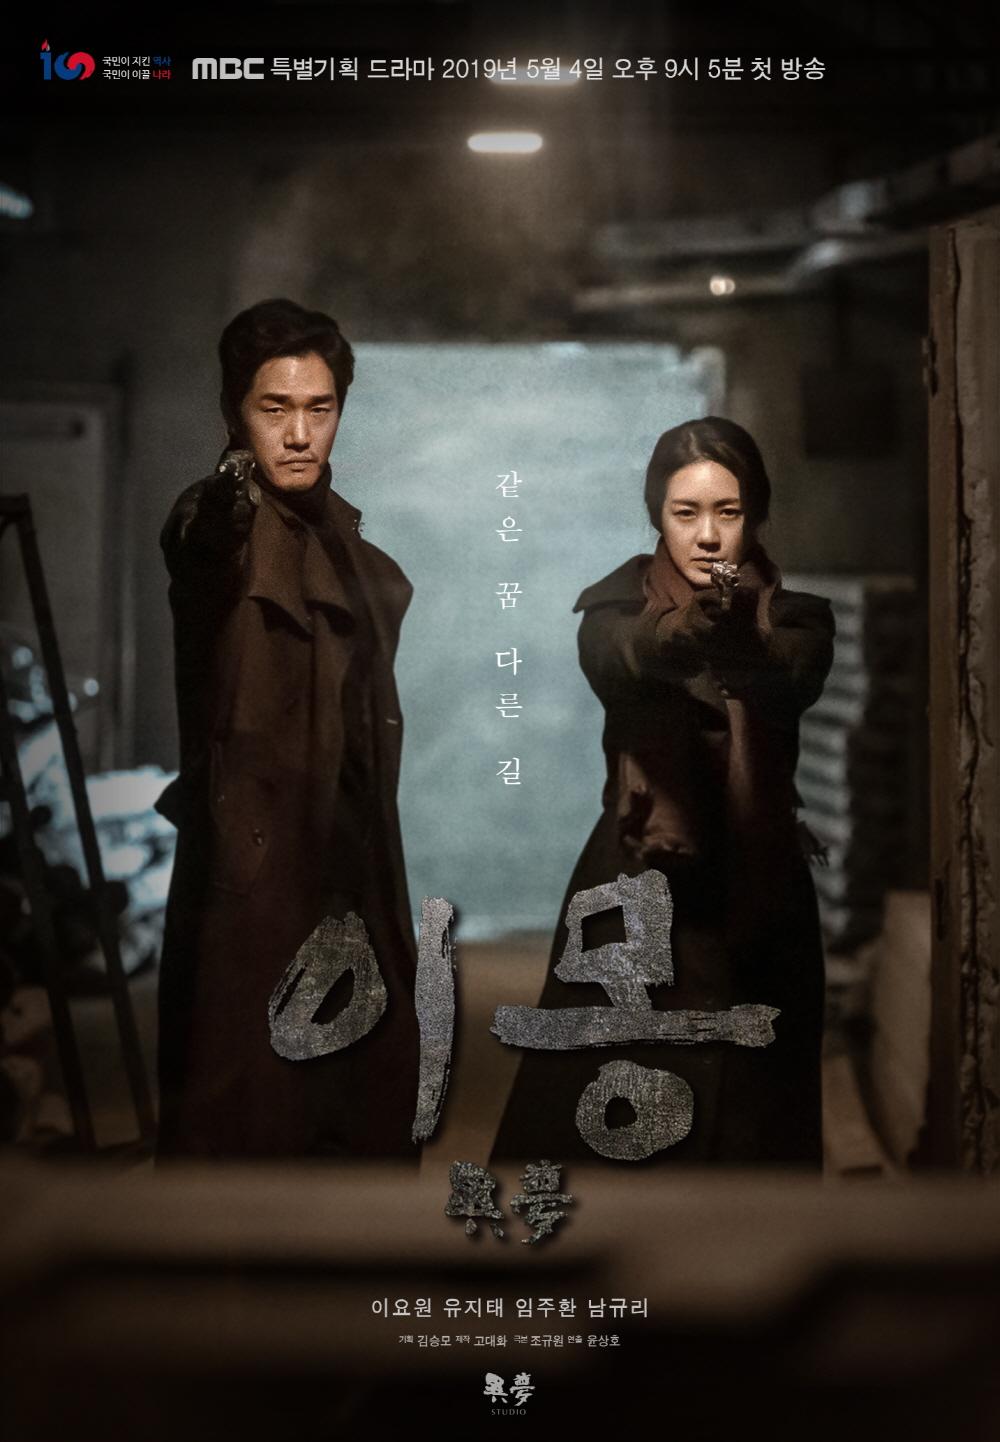 drama Korea tayang Mei instagram